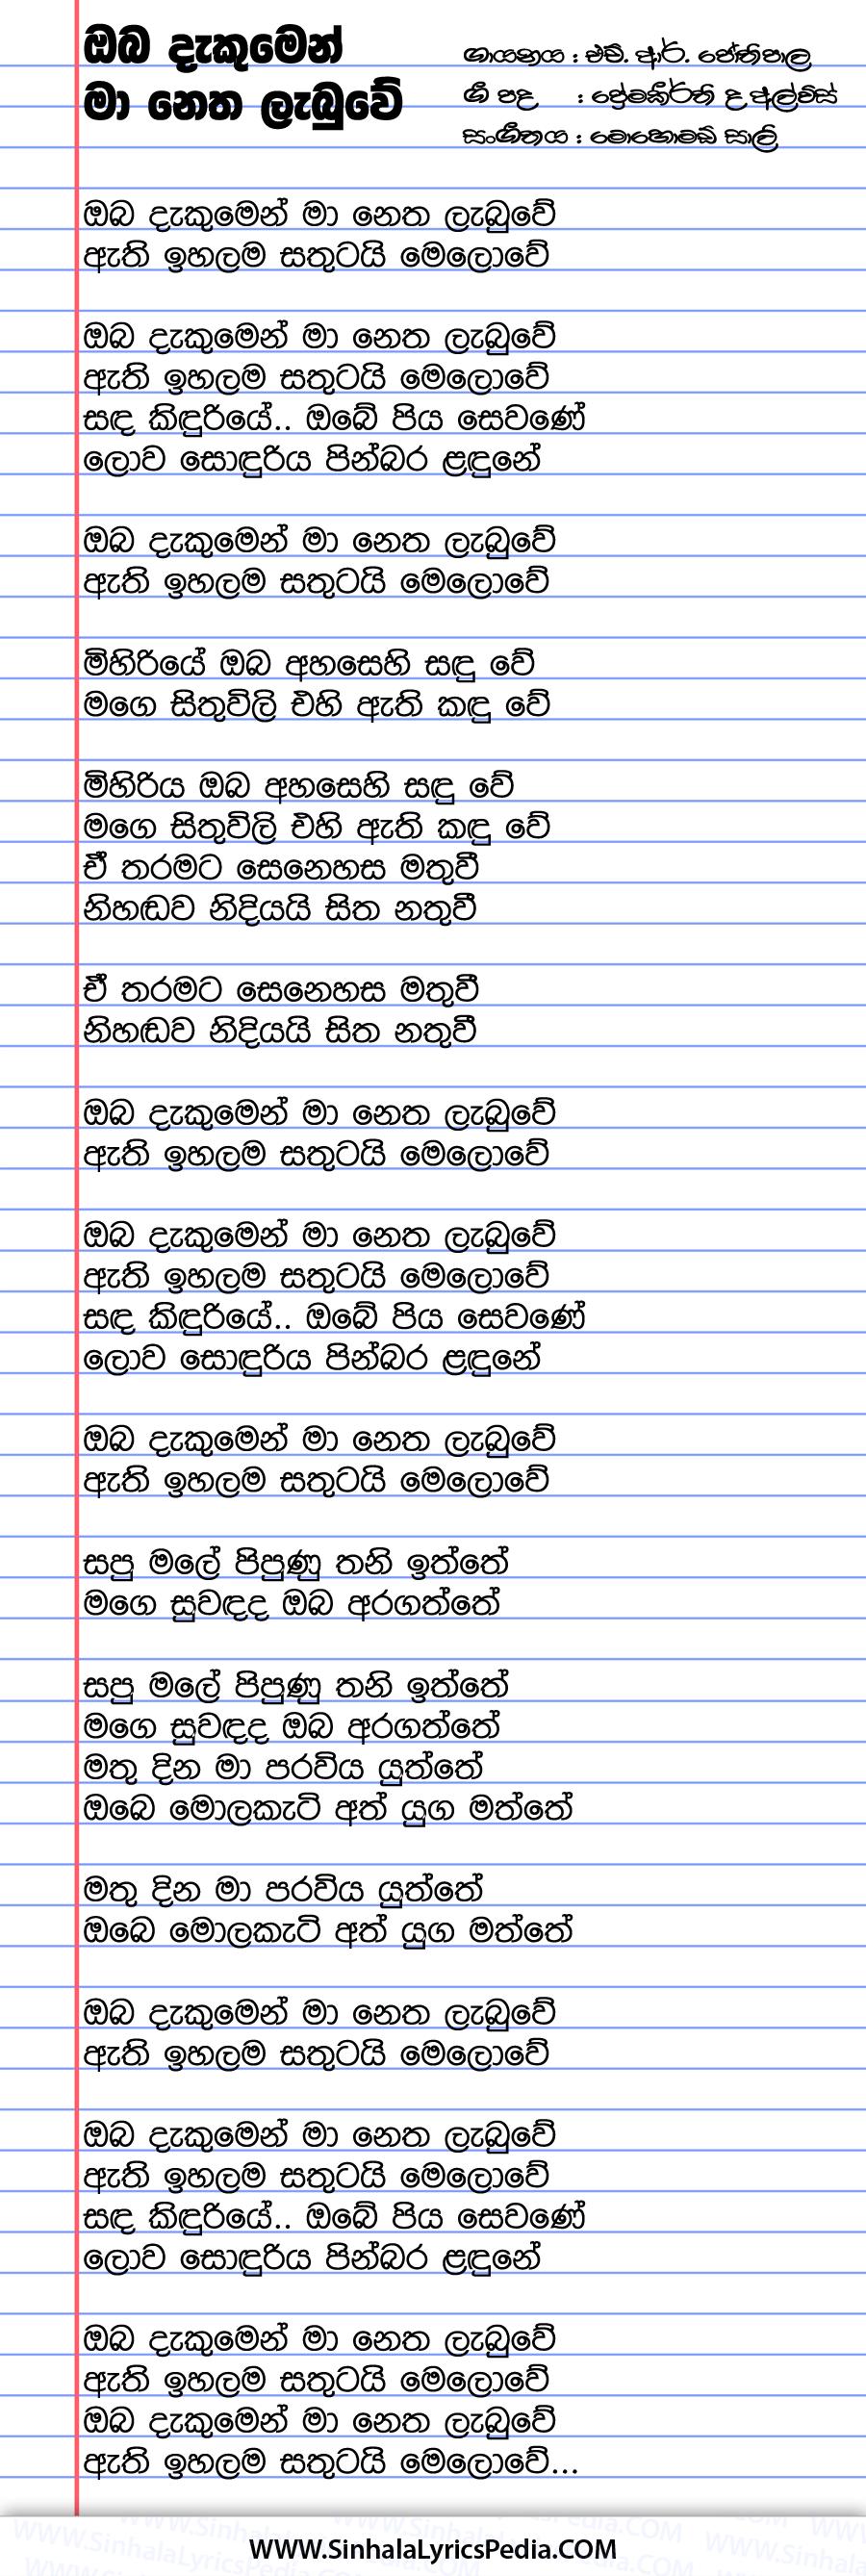 Oba Dakumen Ma Netha Labuwe Song Lyrics